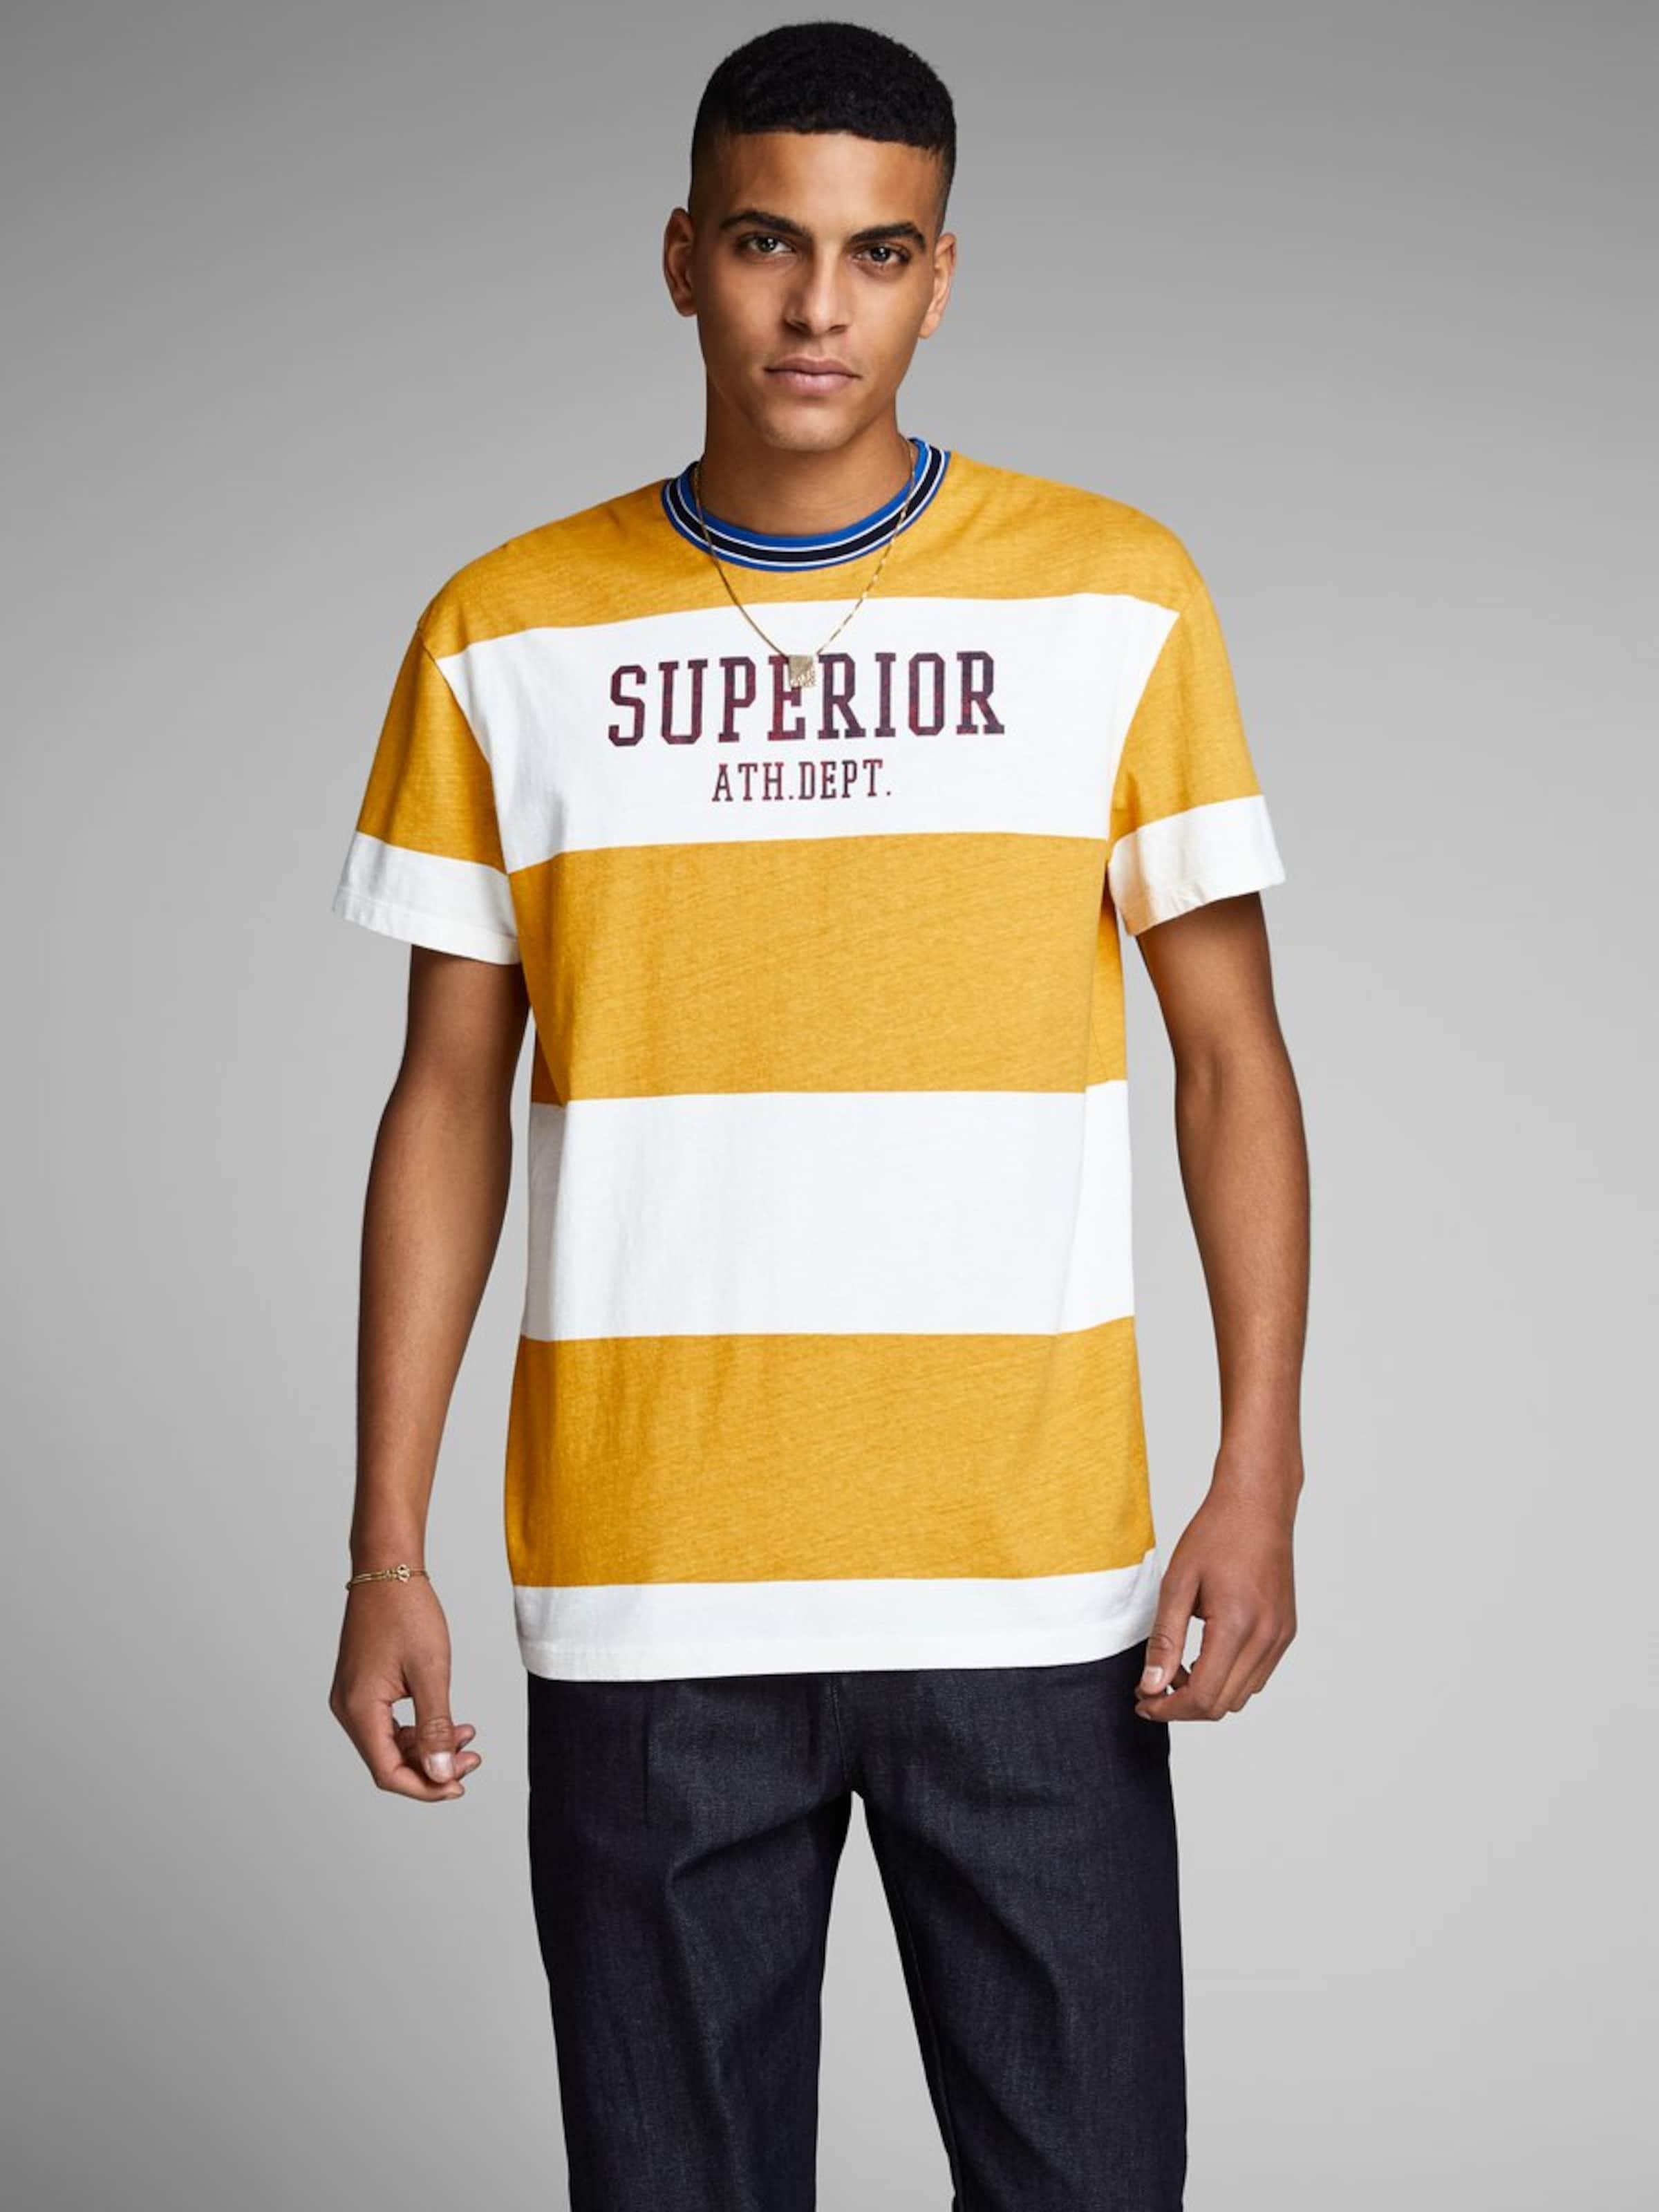 En BleuMarron shirt Miel Noir Jackamp; Jones T Blanc AjLq5ScR34